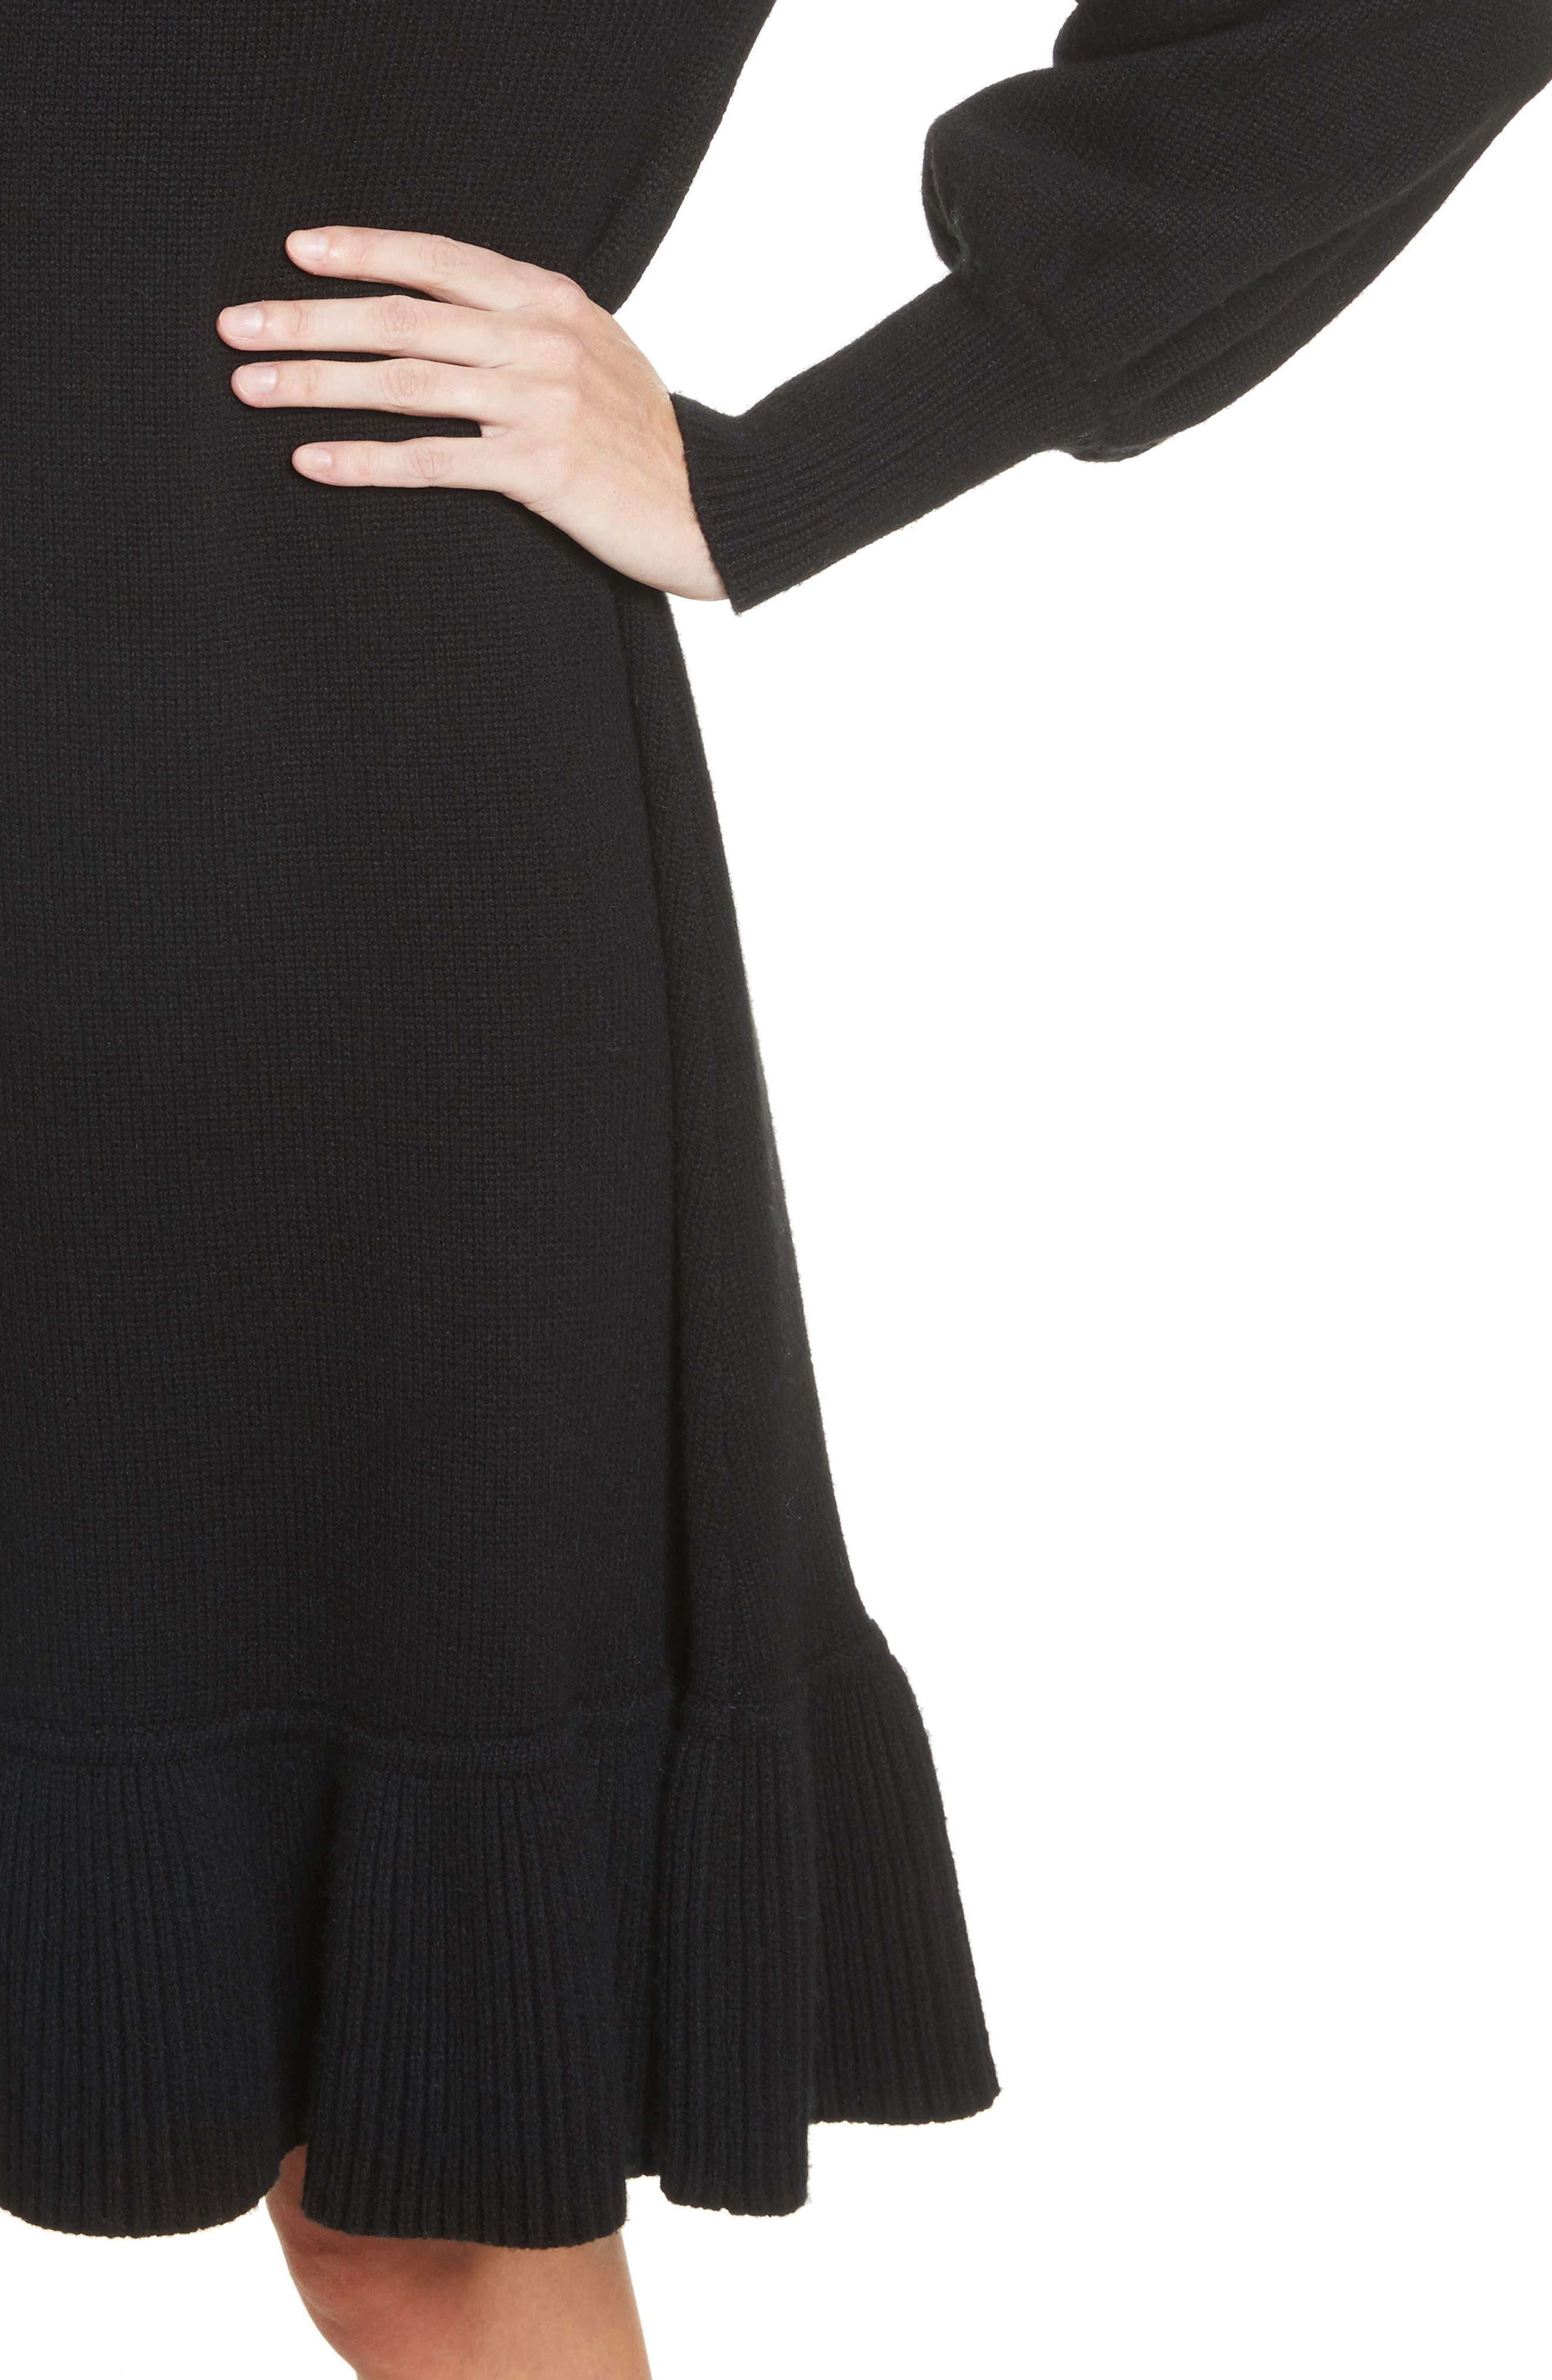 Ruffle Wool & Cashmere Sweater Dress,                             Alternate thumbnail 4, color,                             Black